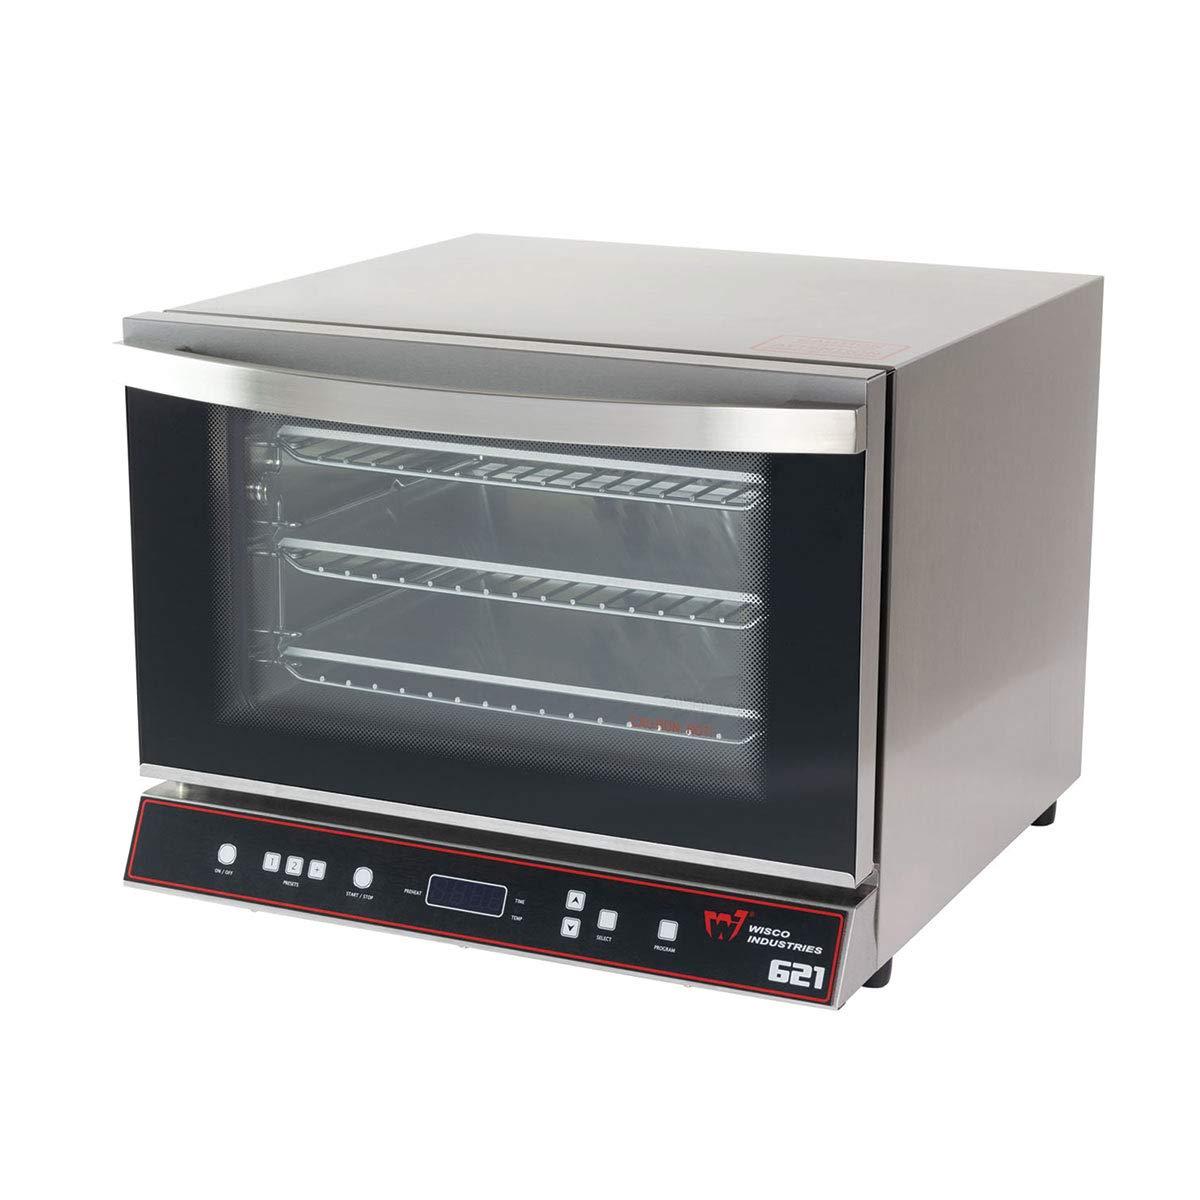 Wisco 621 Digital Commercial Countertop Convection Oven